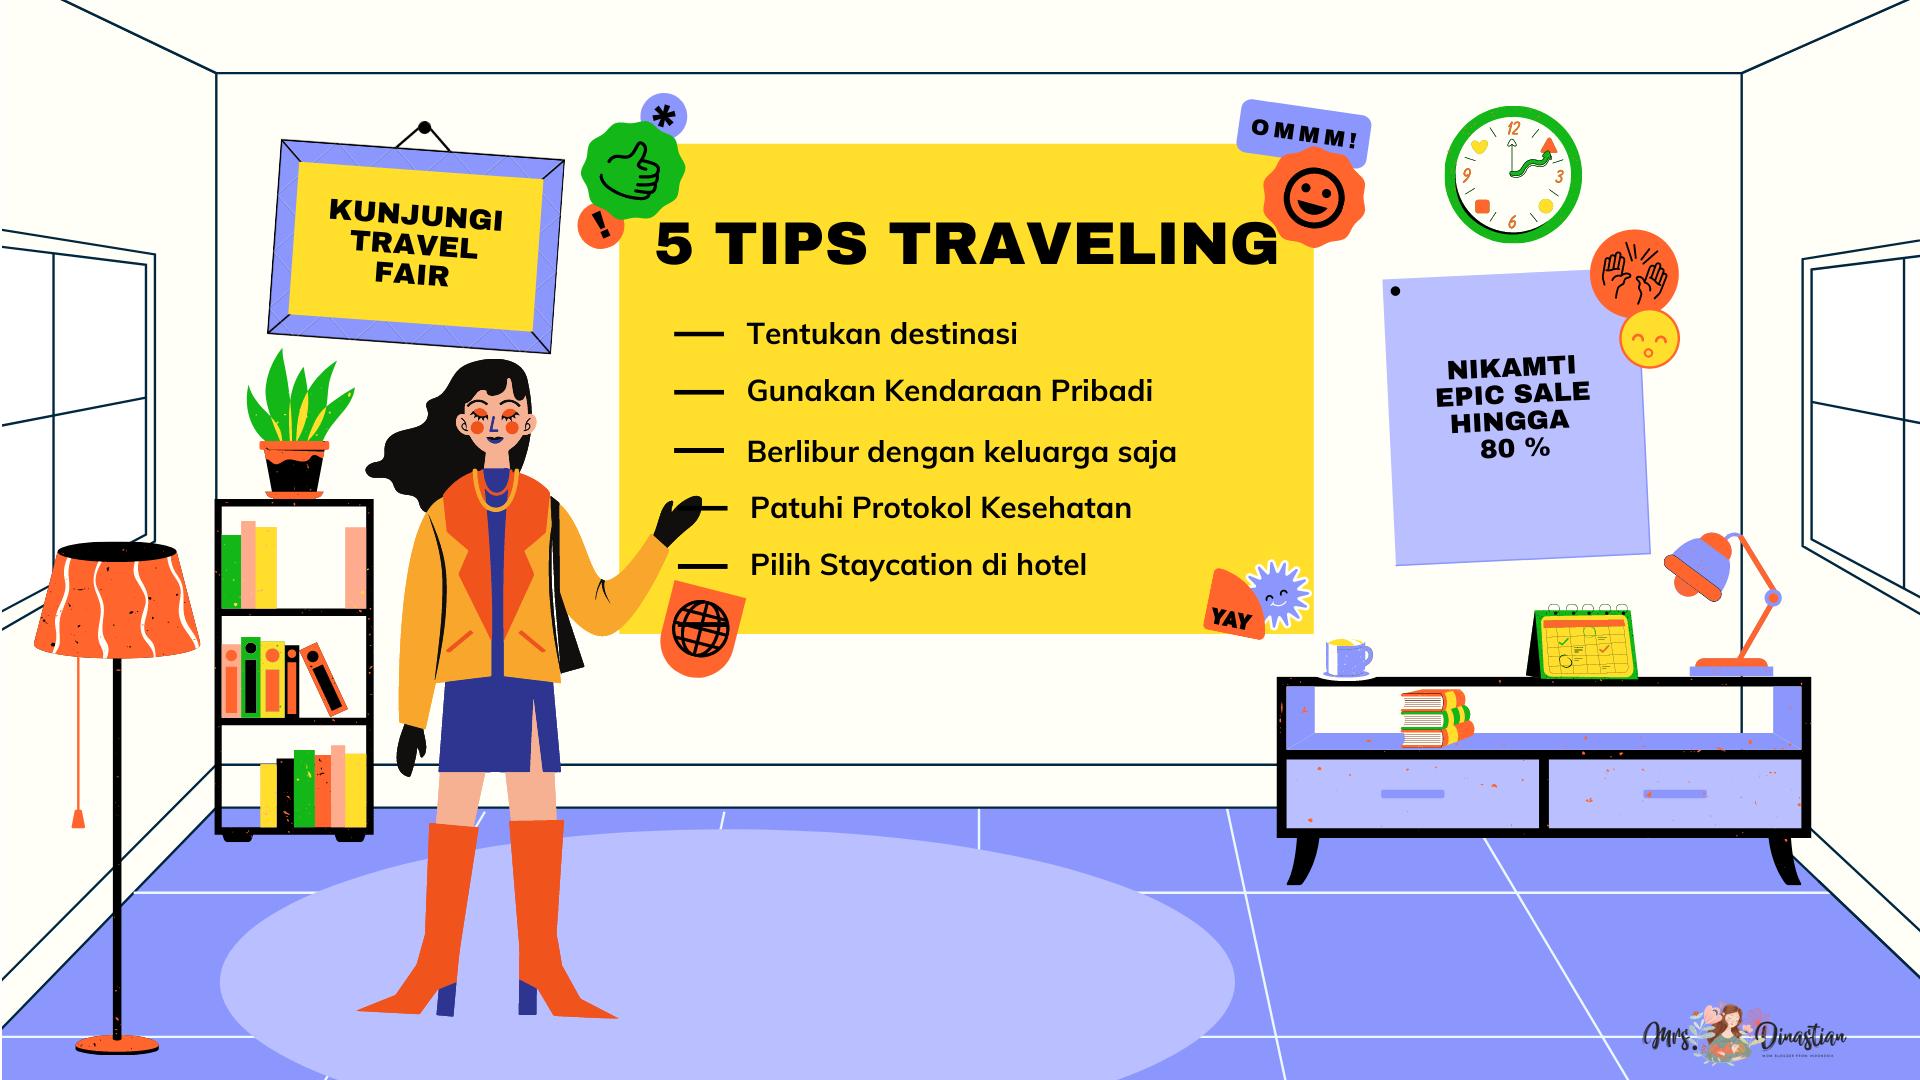 5 Tips Traveling ditengah pandemi covid-19